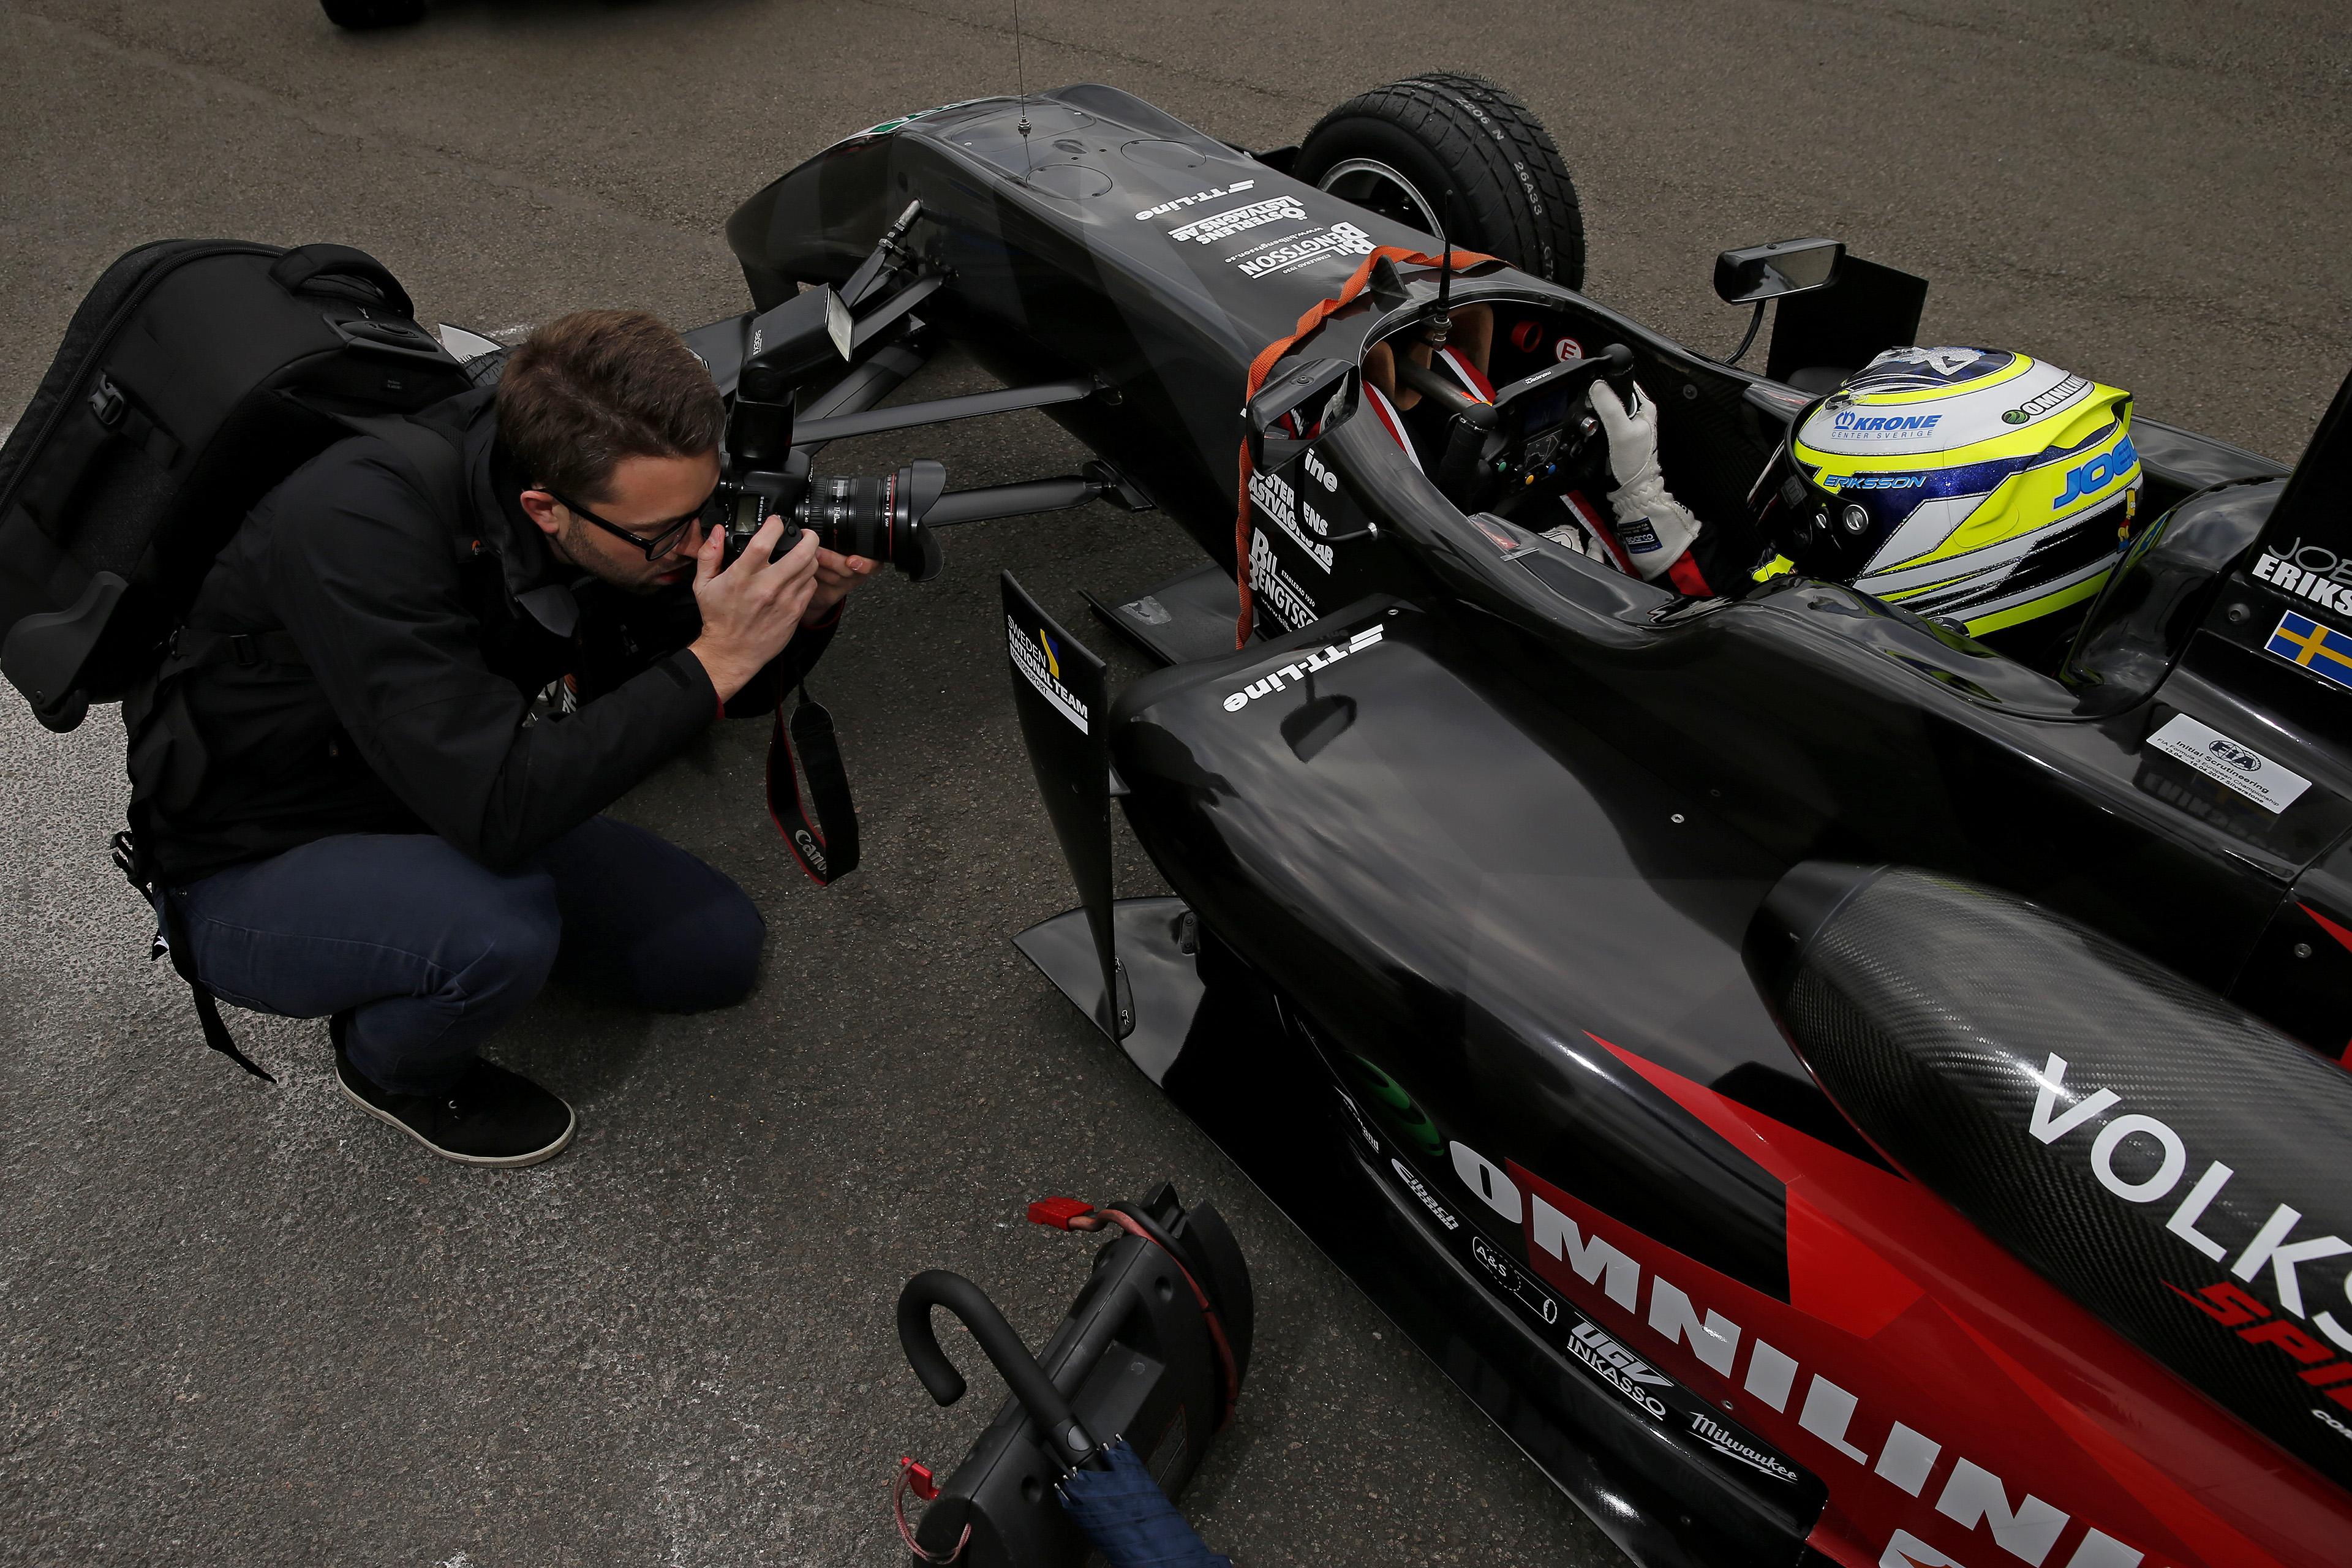 2017-FIA-F3-01-Suer-1003